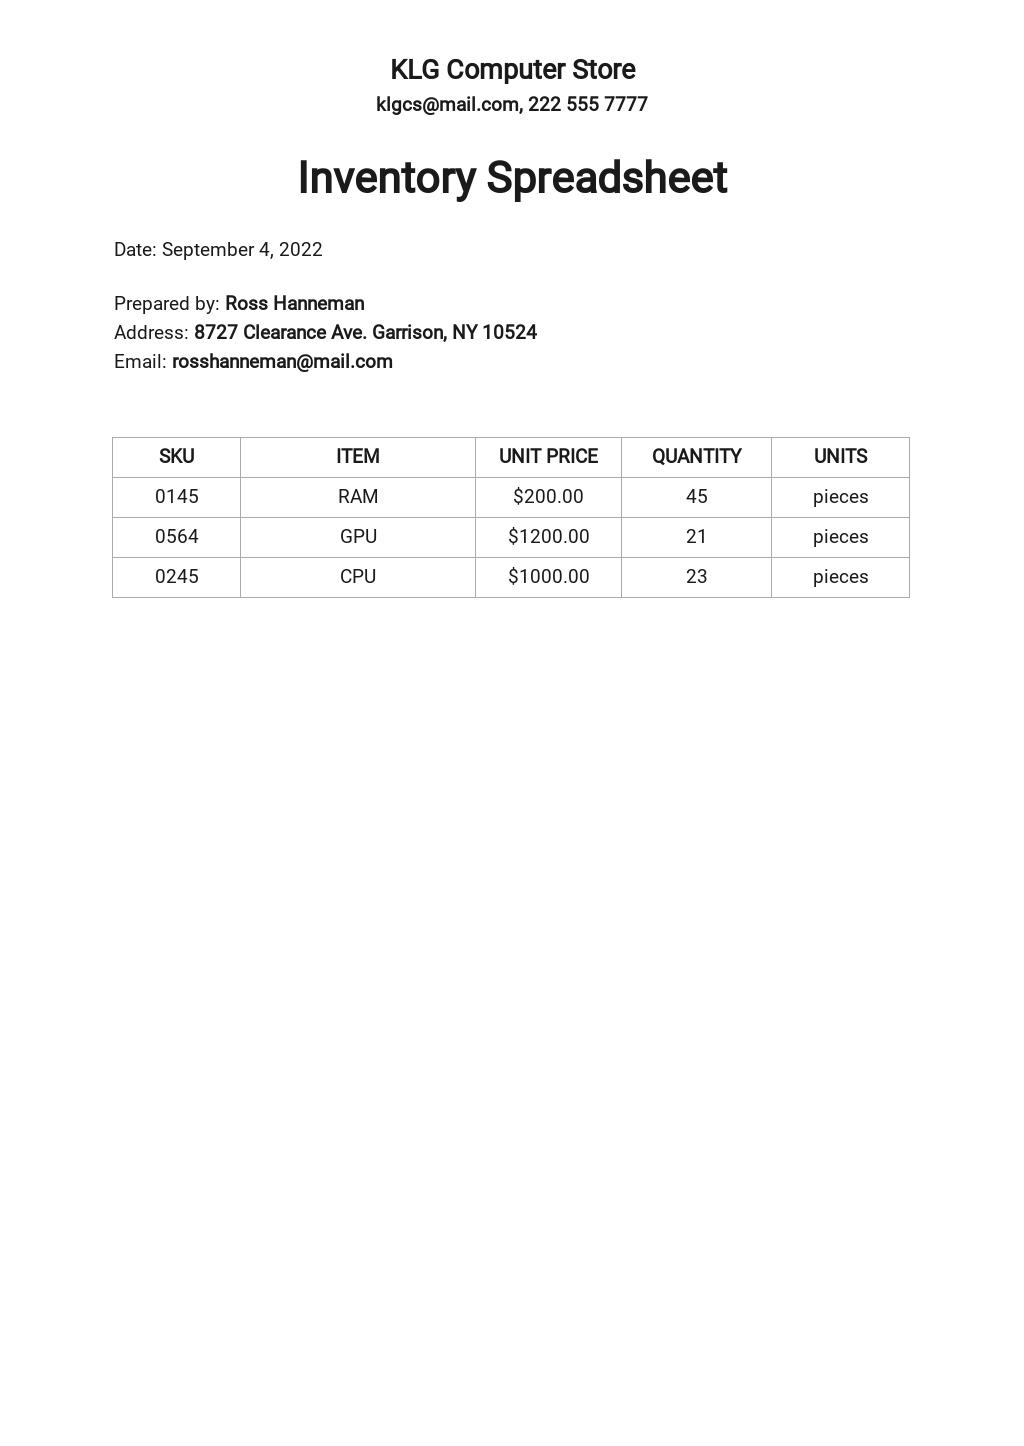 Inventory Spreadsheet Template.jpe